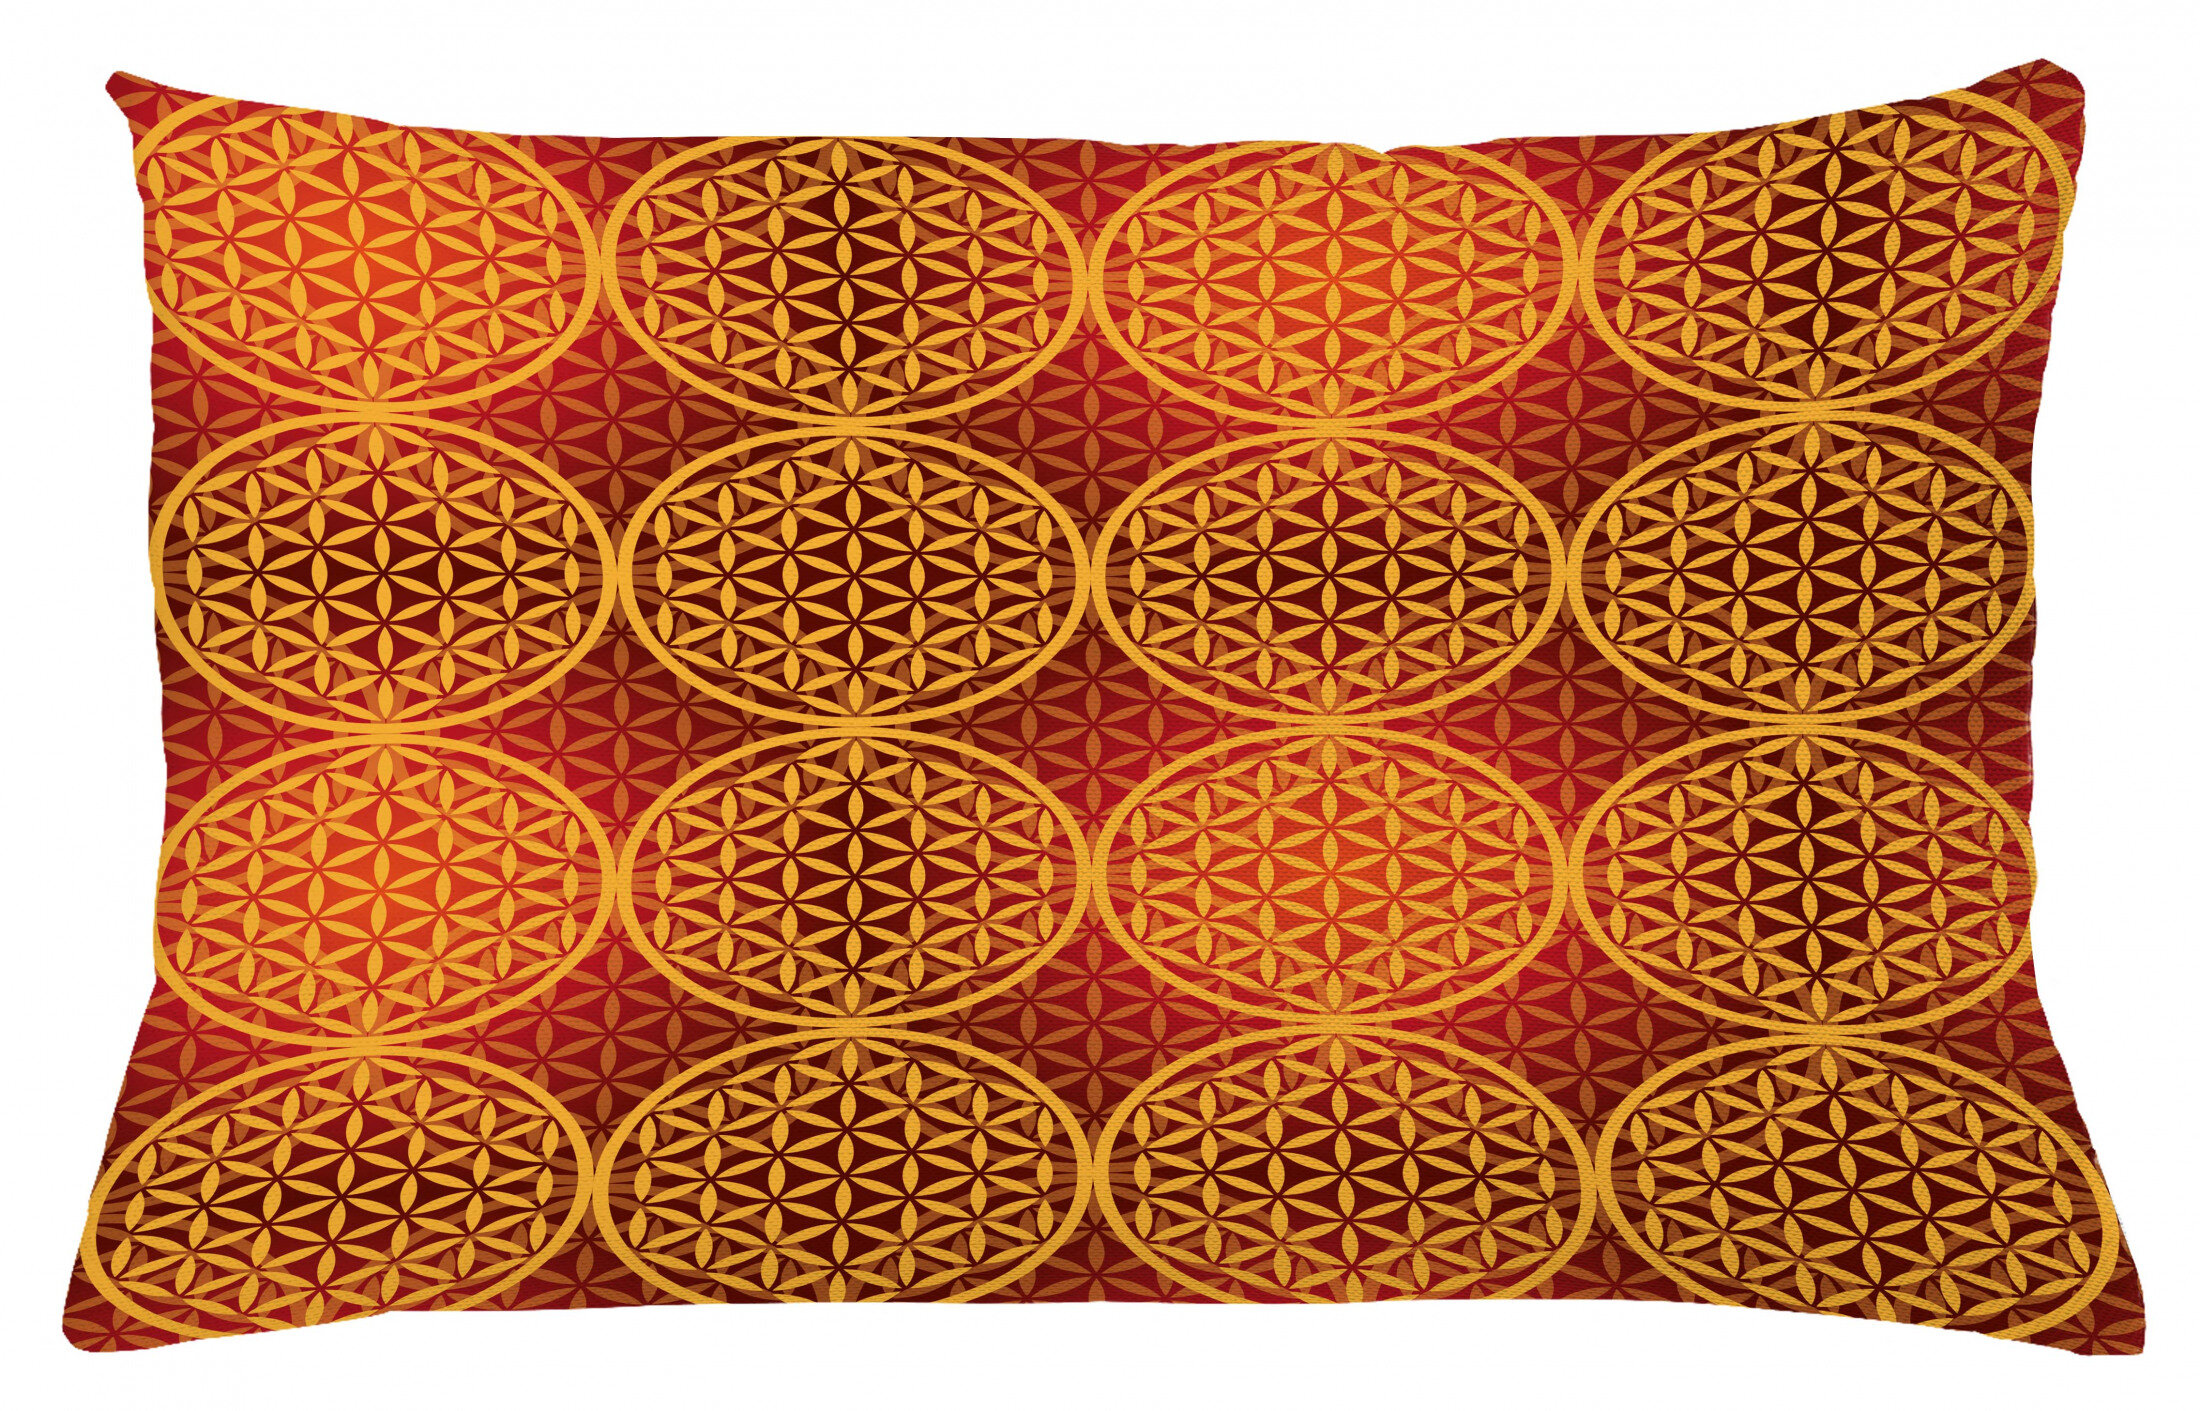 East Urban Home Victorian Indoor Outdoor Floral Lumbar Pillow Cover Wayfair